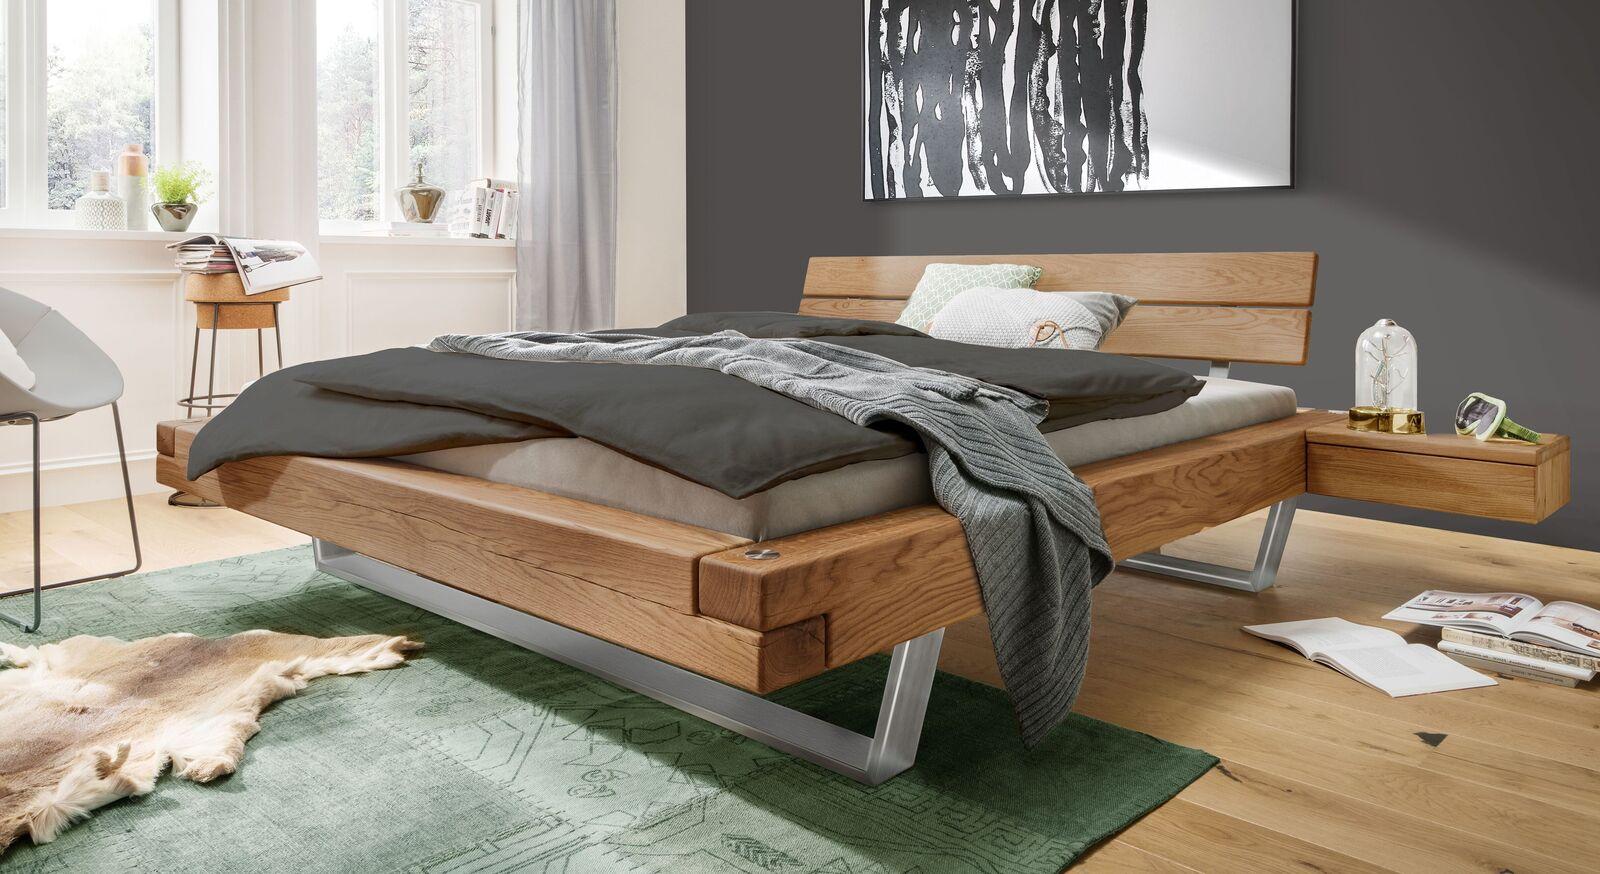 Bett Borka in angesagtem Industrial-Style